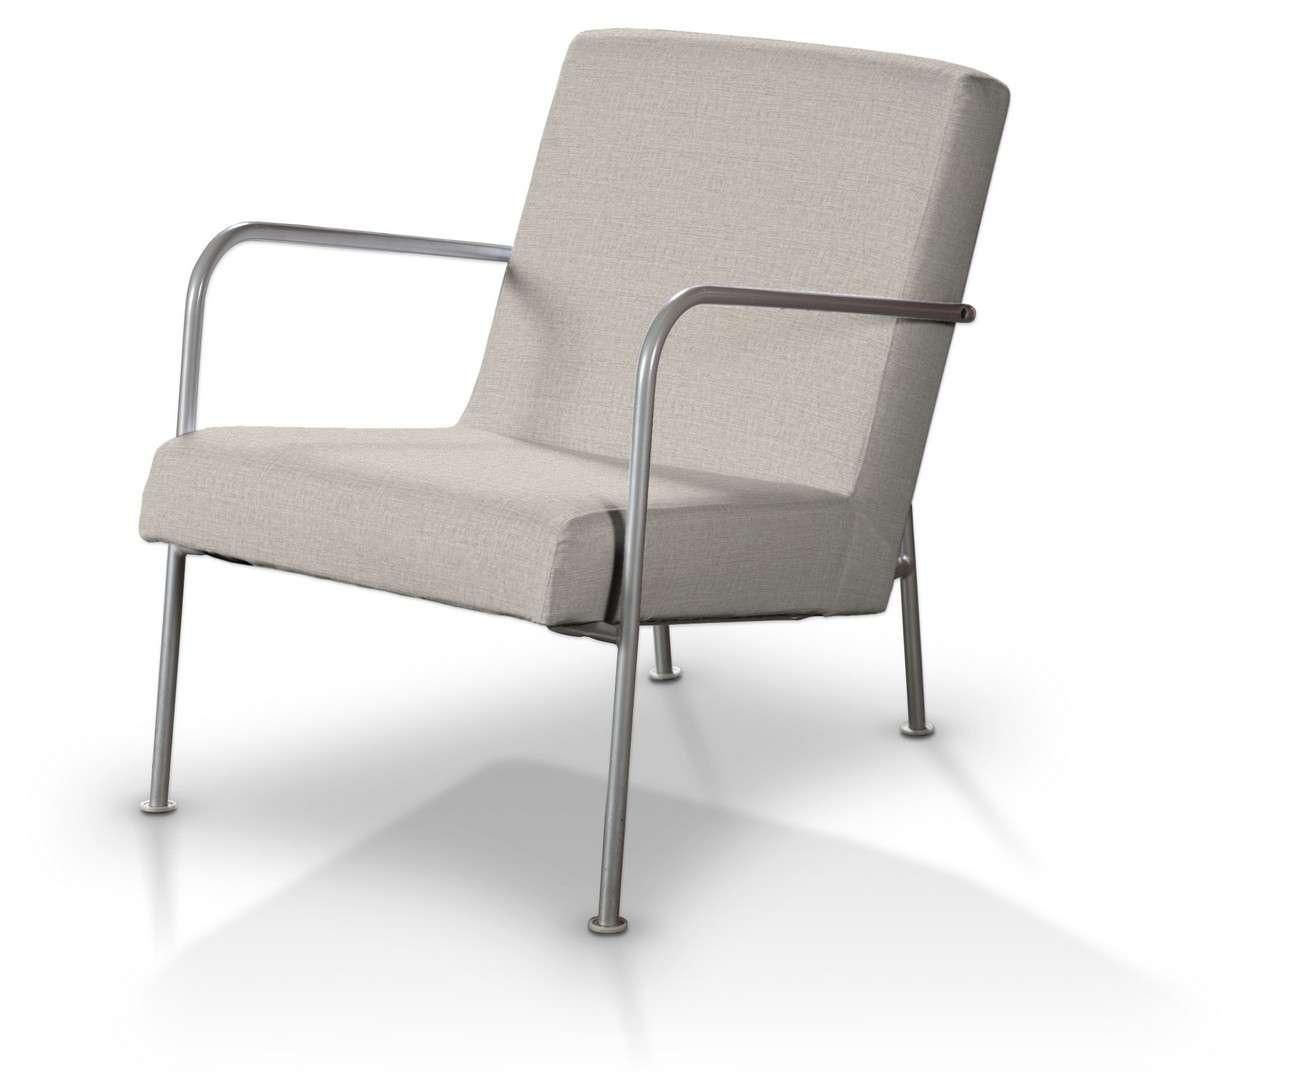 Potah na křeslo Ikea PS v kolekci Living II, látka: 161-00